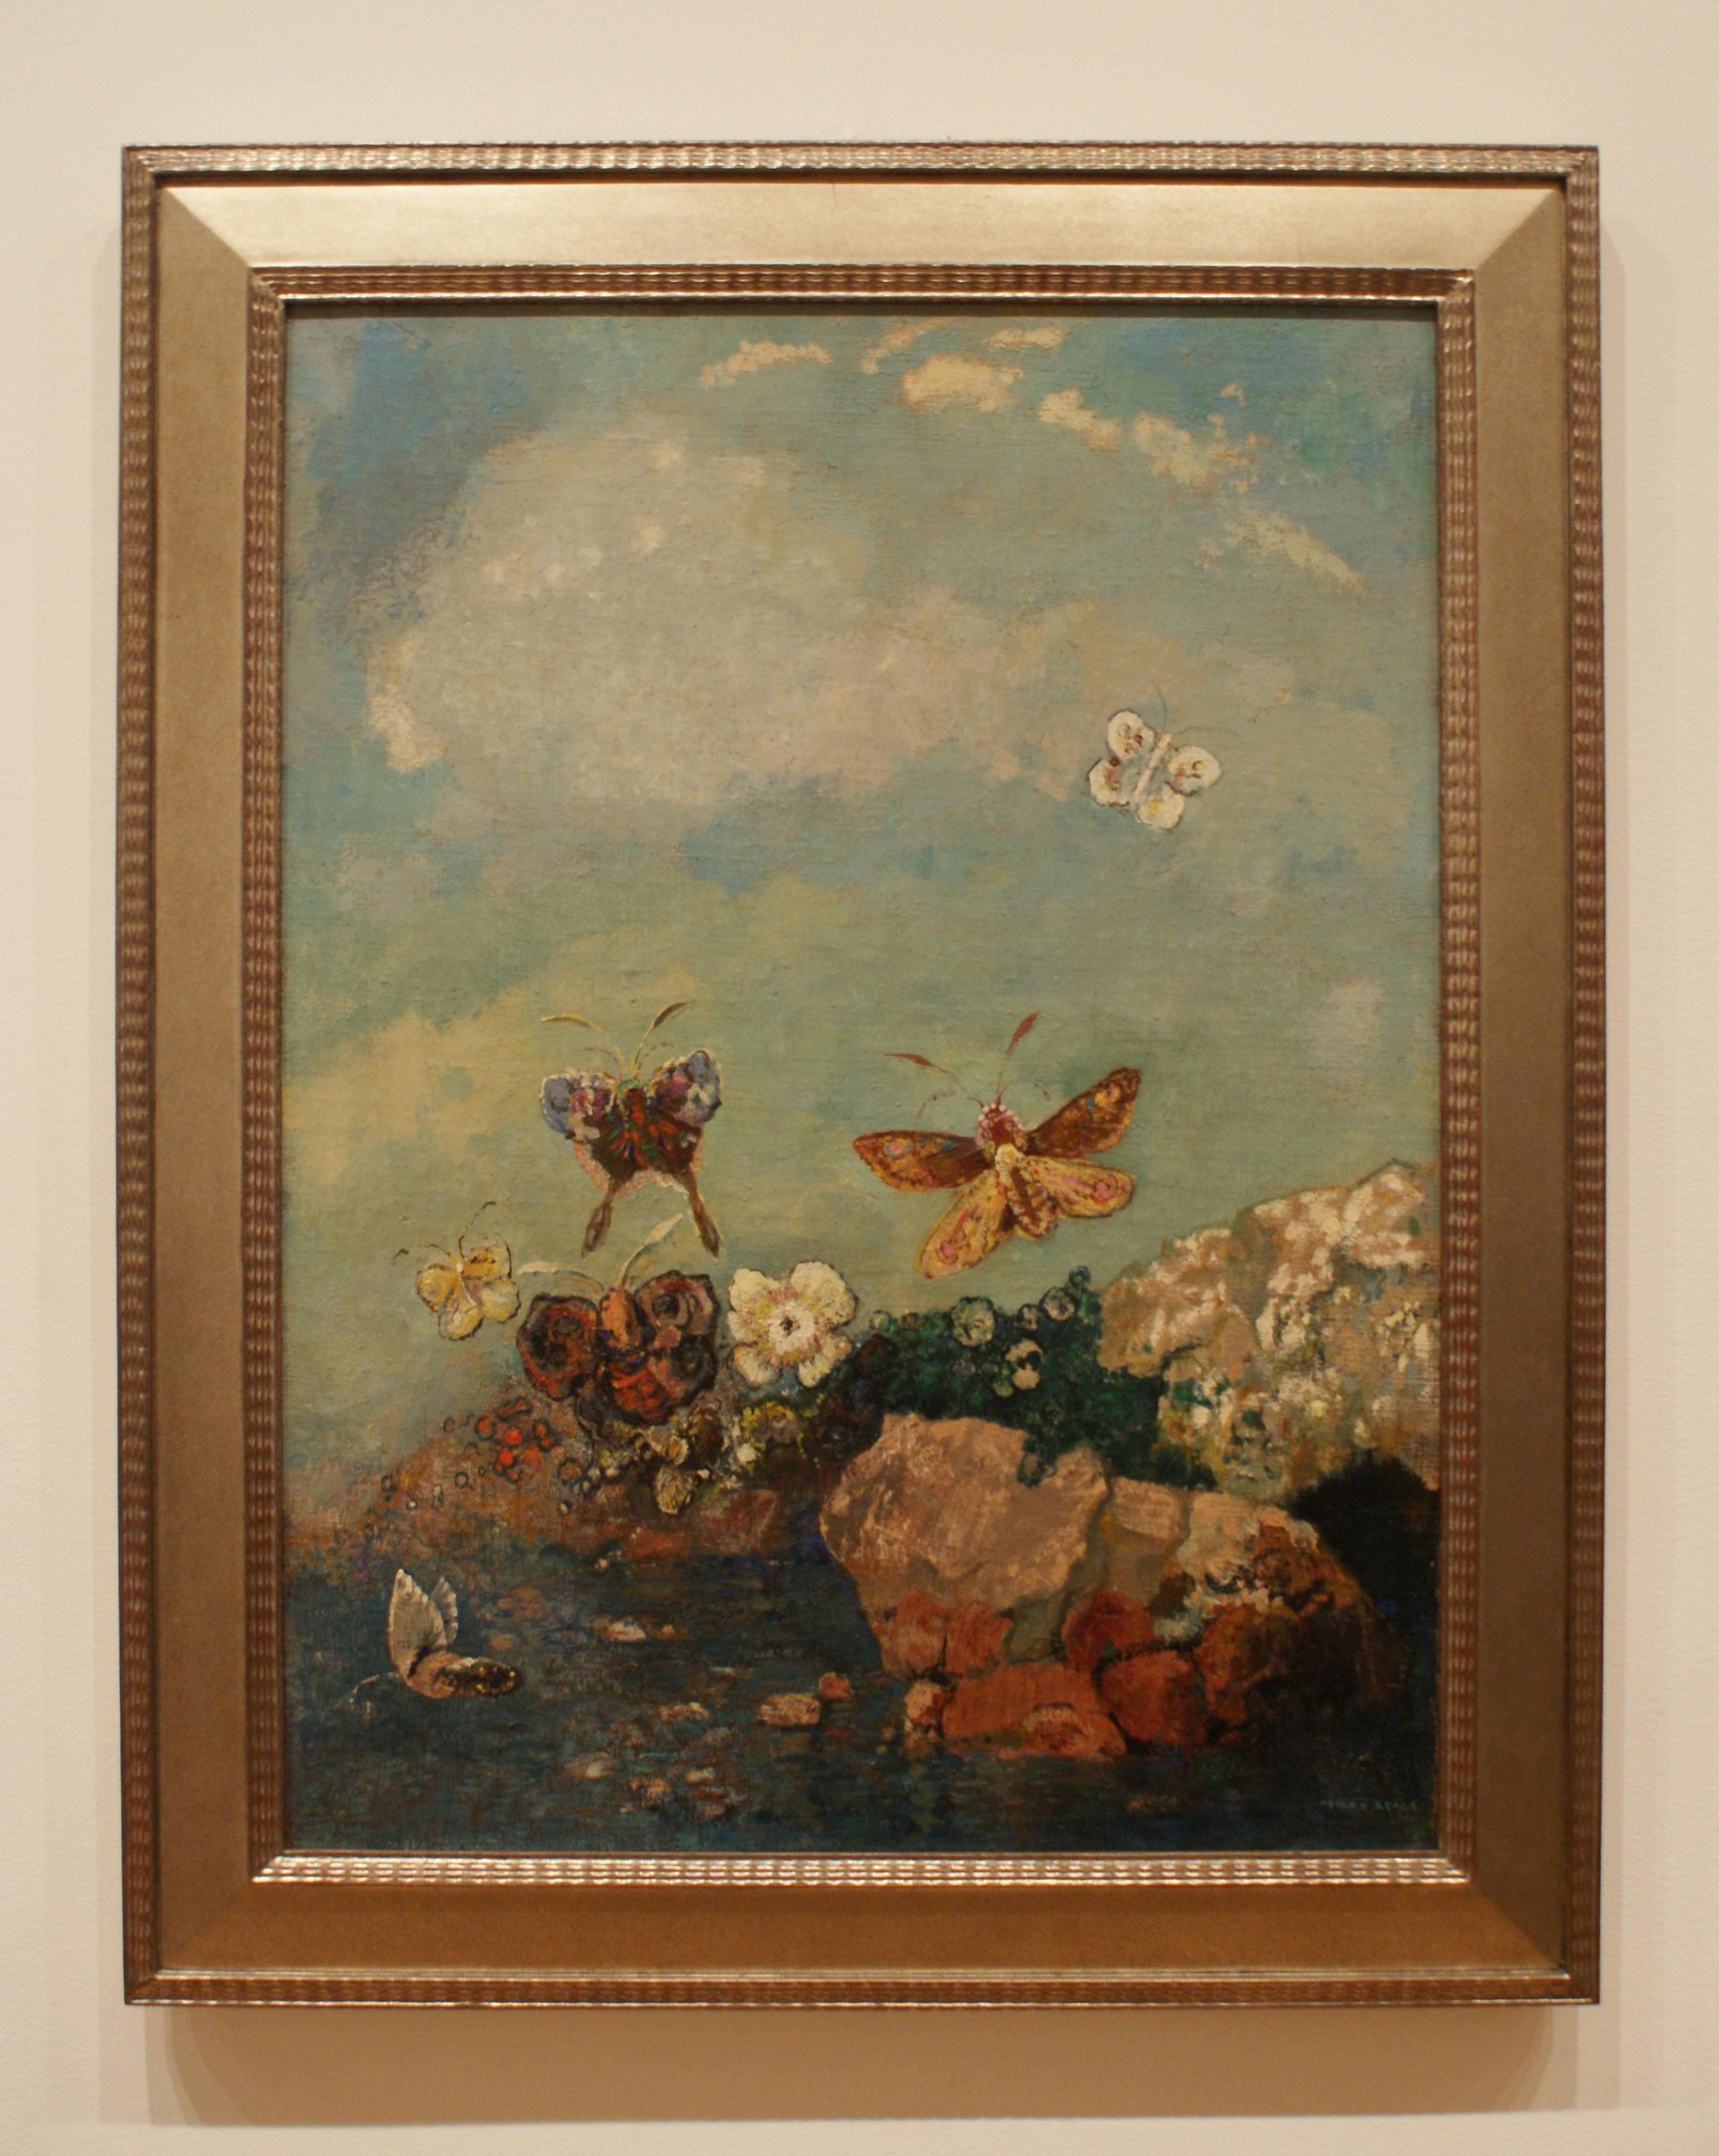 File:WLA moma Butterflies by Odilon Redon 2.jpg - Wikimedia Commons